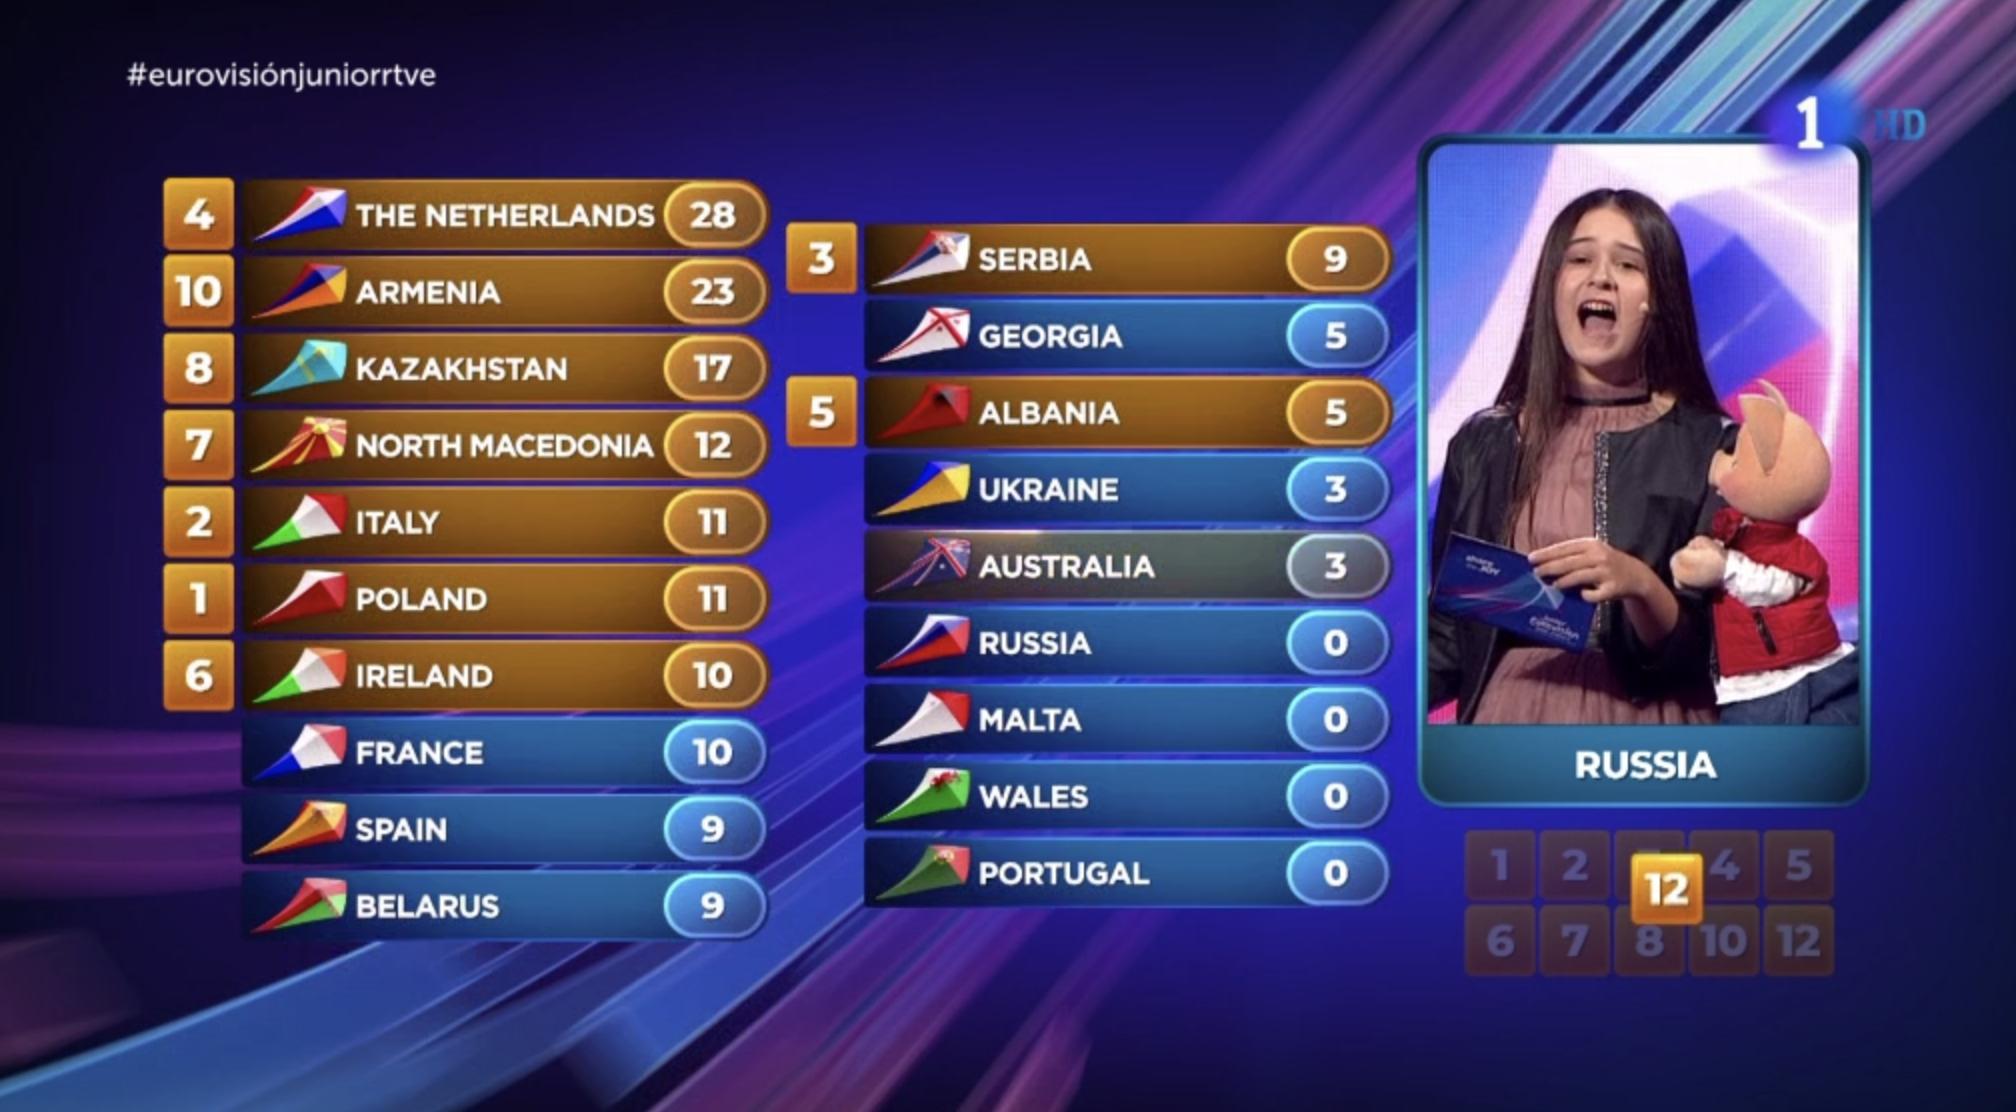 Rusia nos da 9 puntos. El jurado da los 12 a Australia